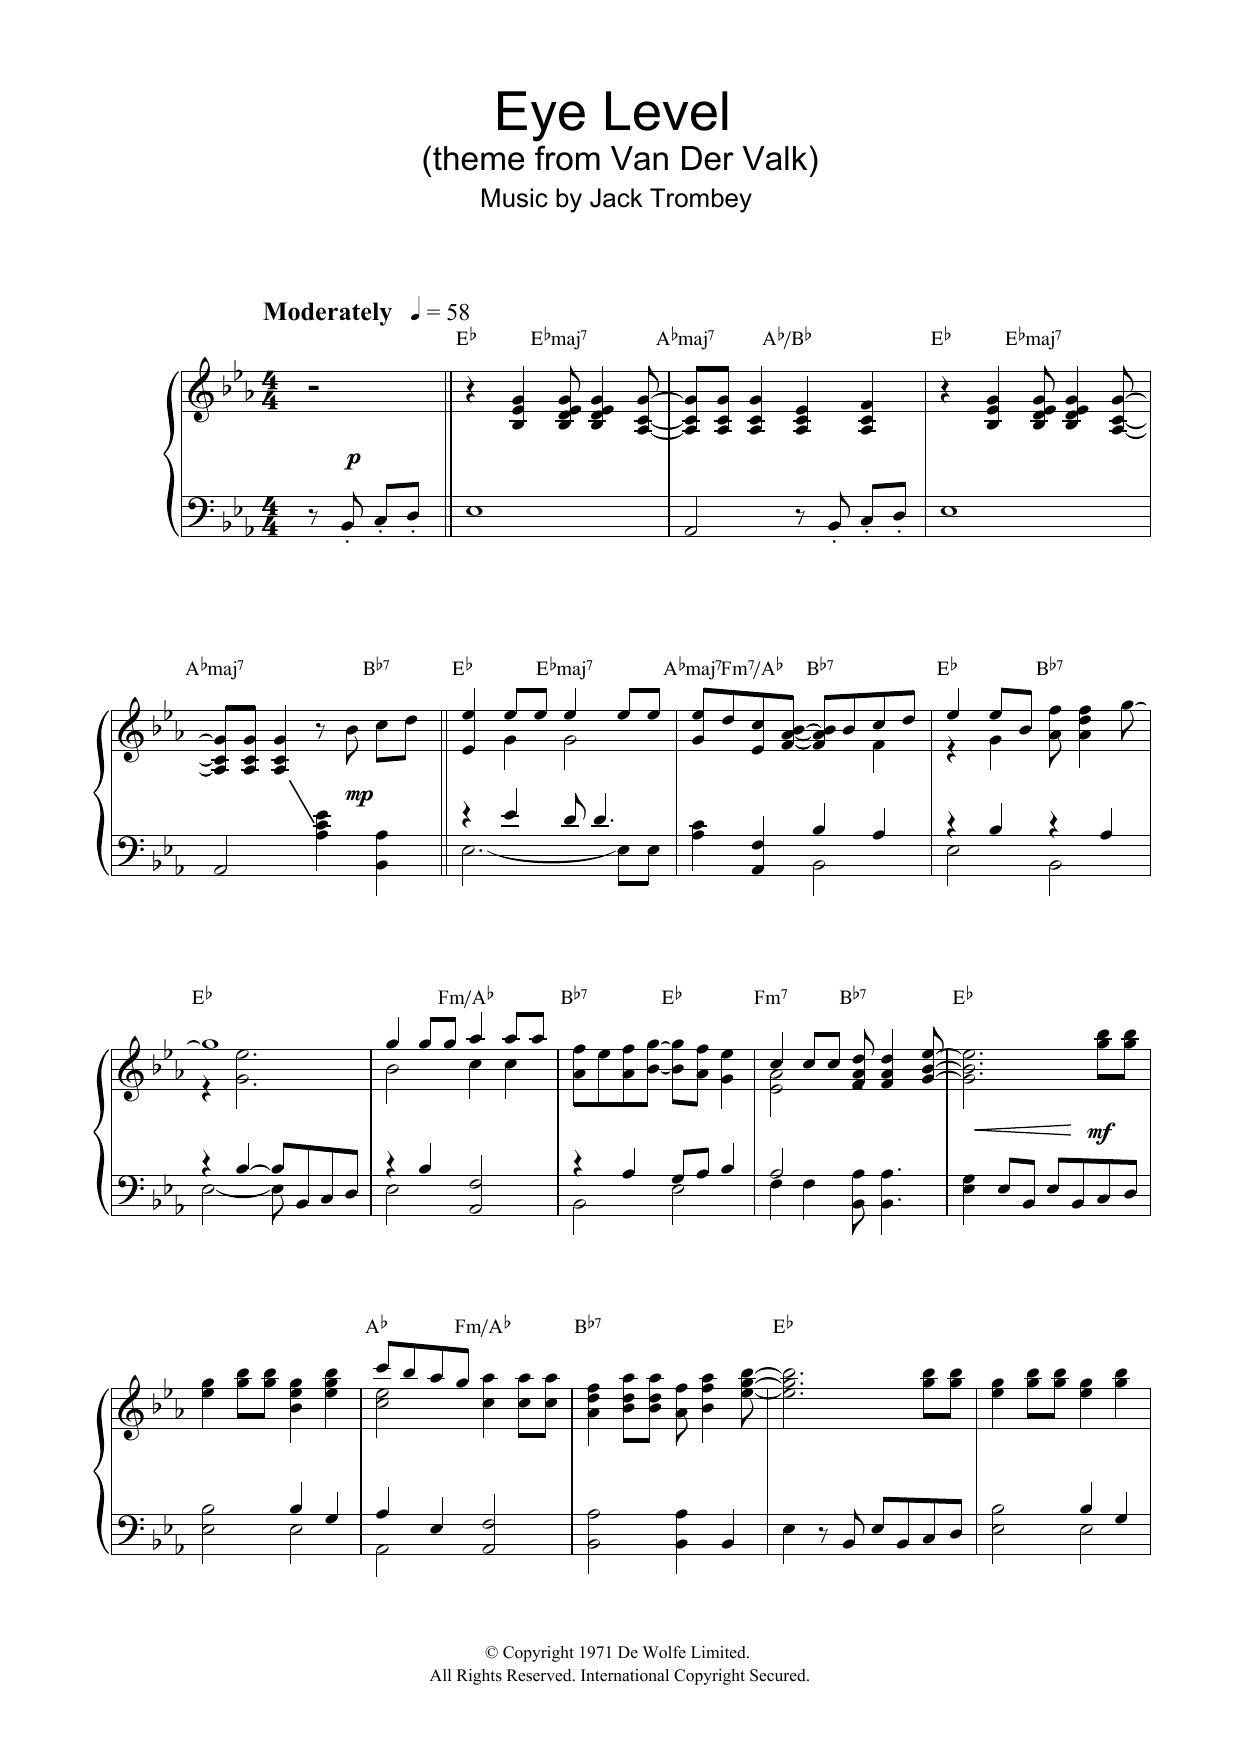 Eye Level (theme from Van Der Valk) Sheet Music